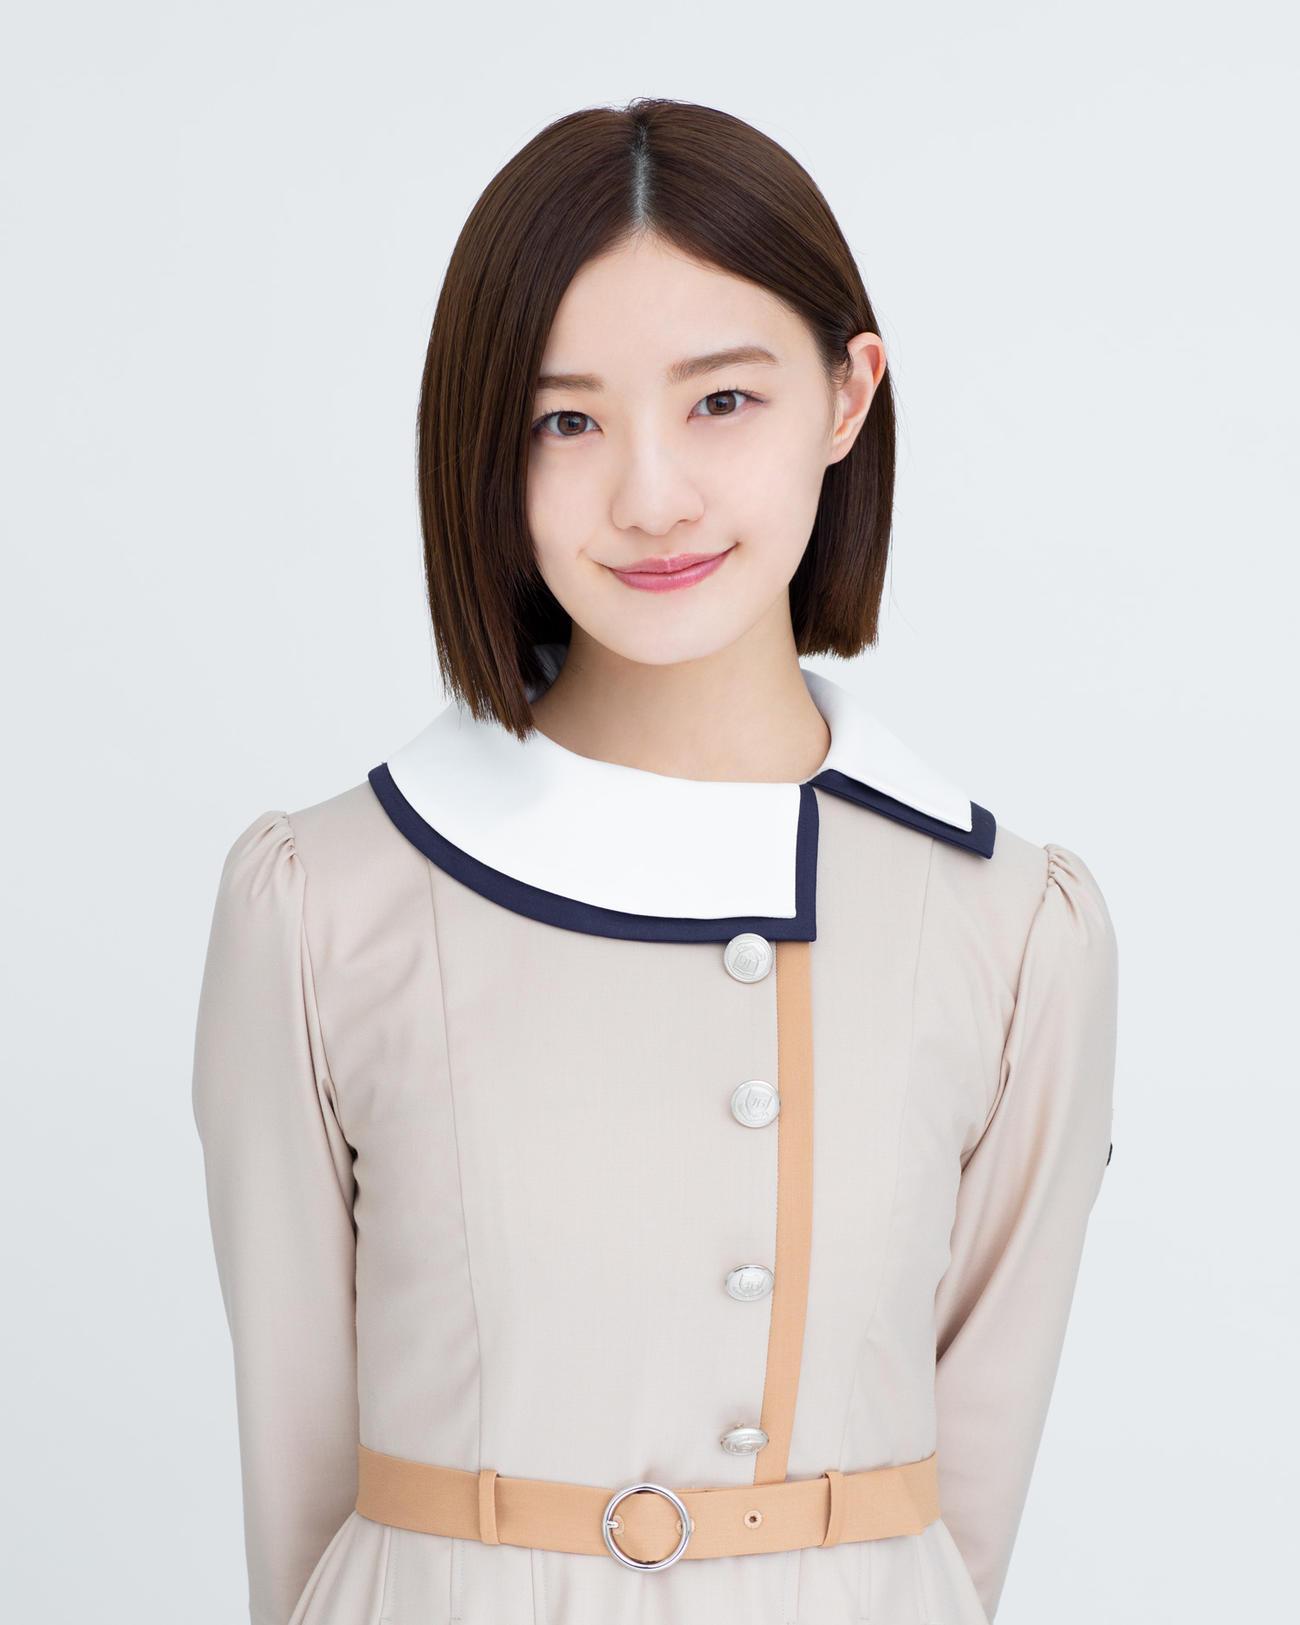 乃木坂46の中田花奈